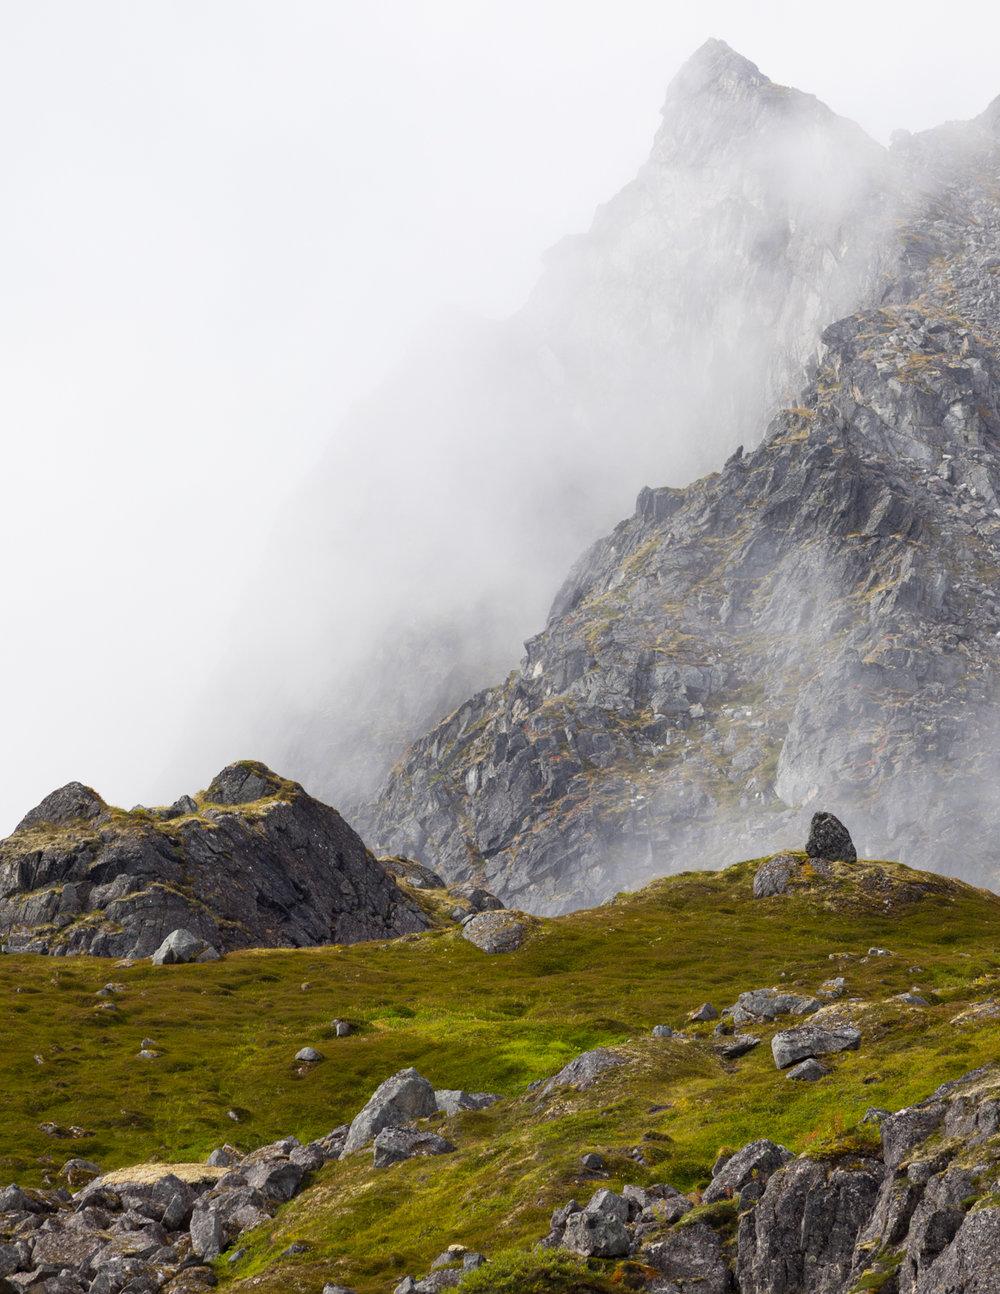 Talkeetna Mountains, Reed Lakes Trail, Hatcher Pass